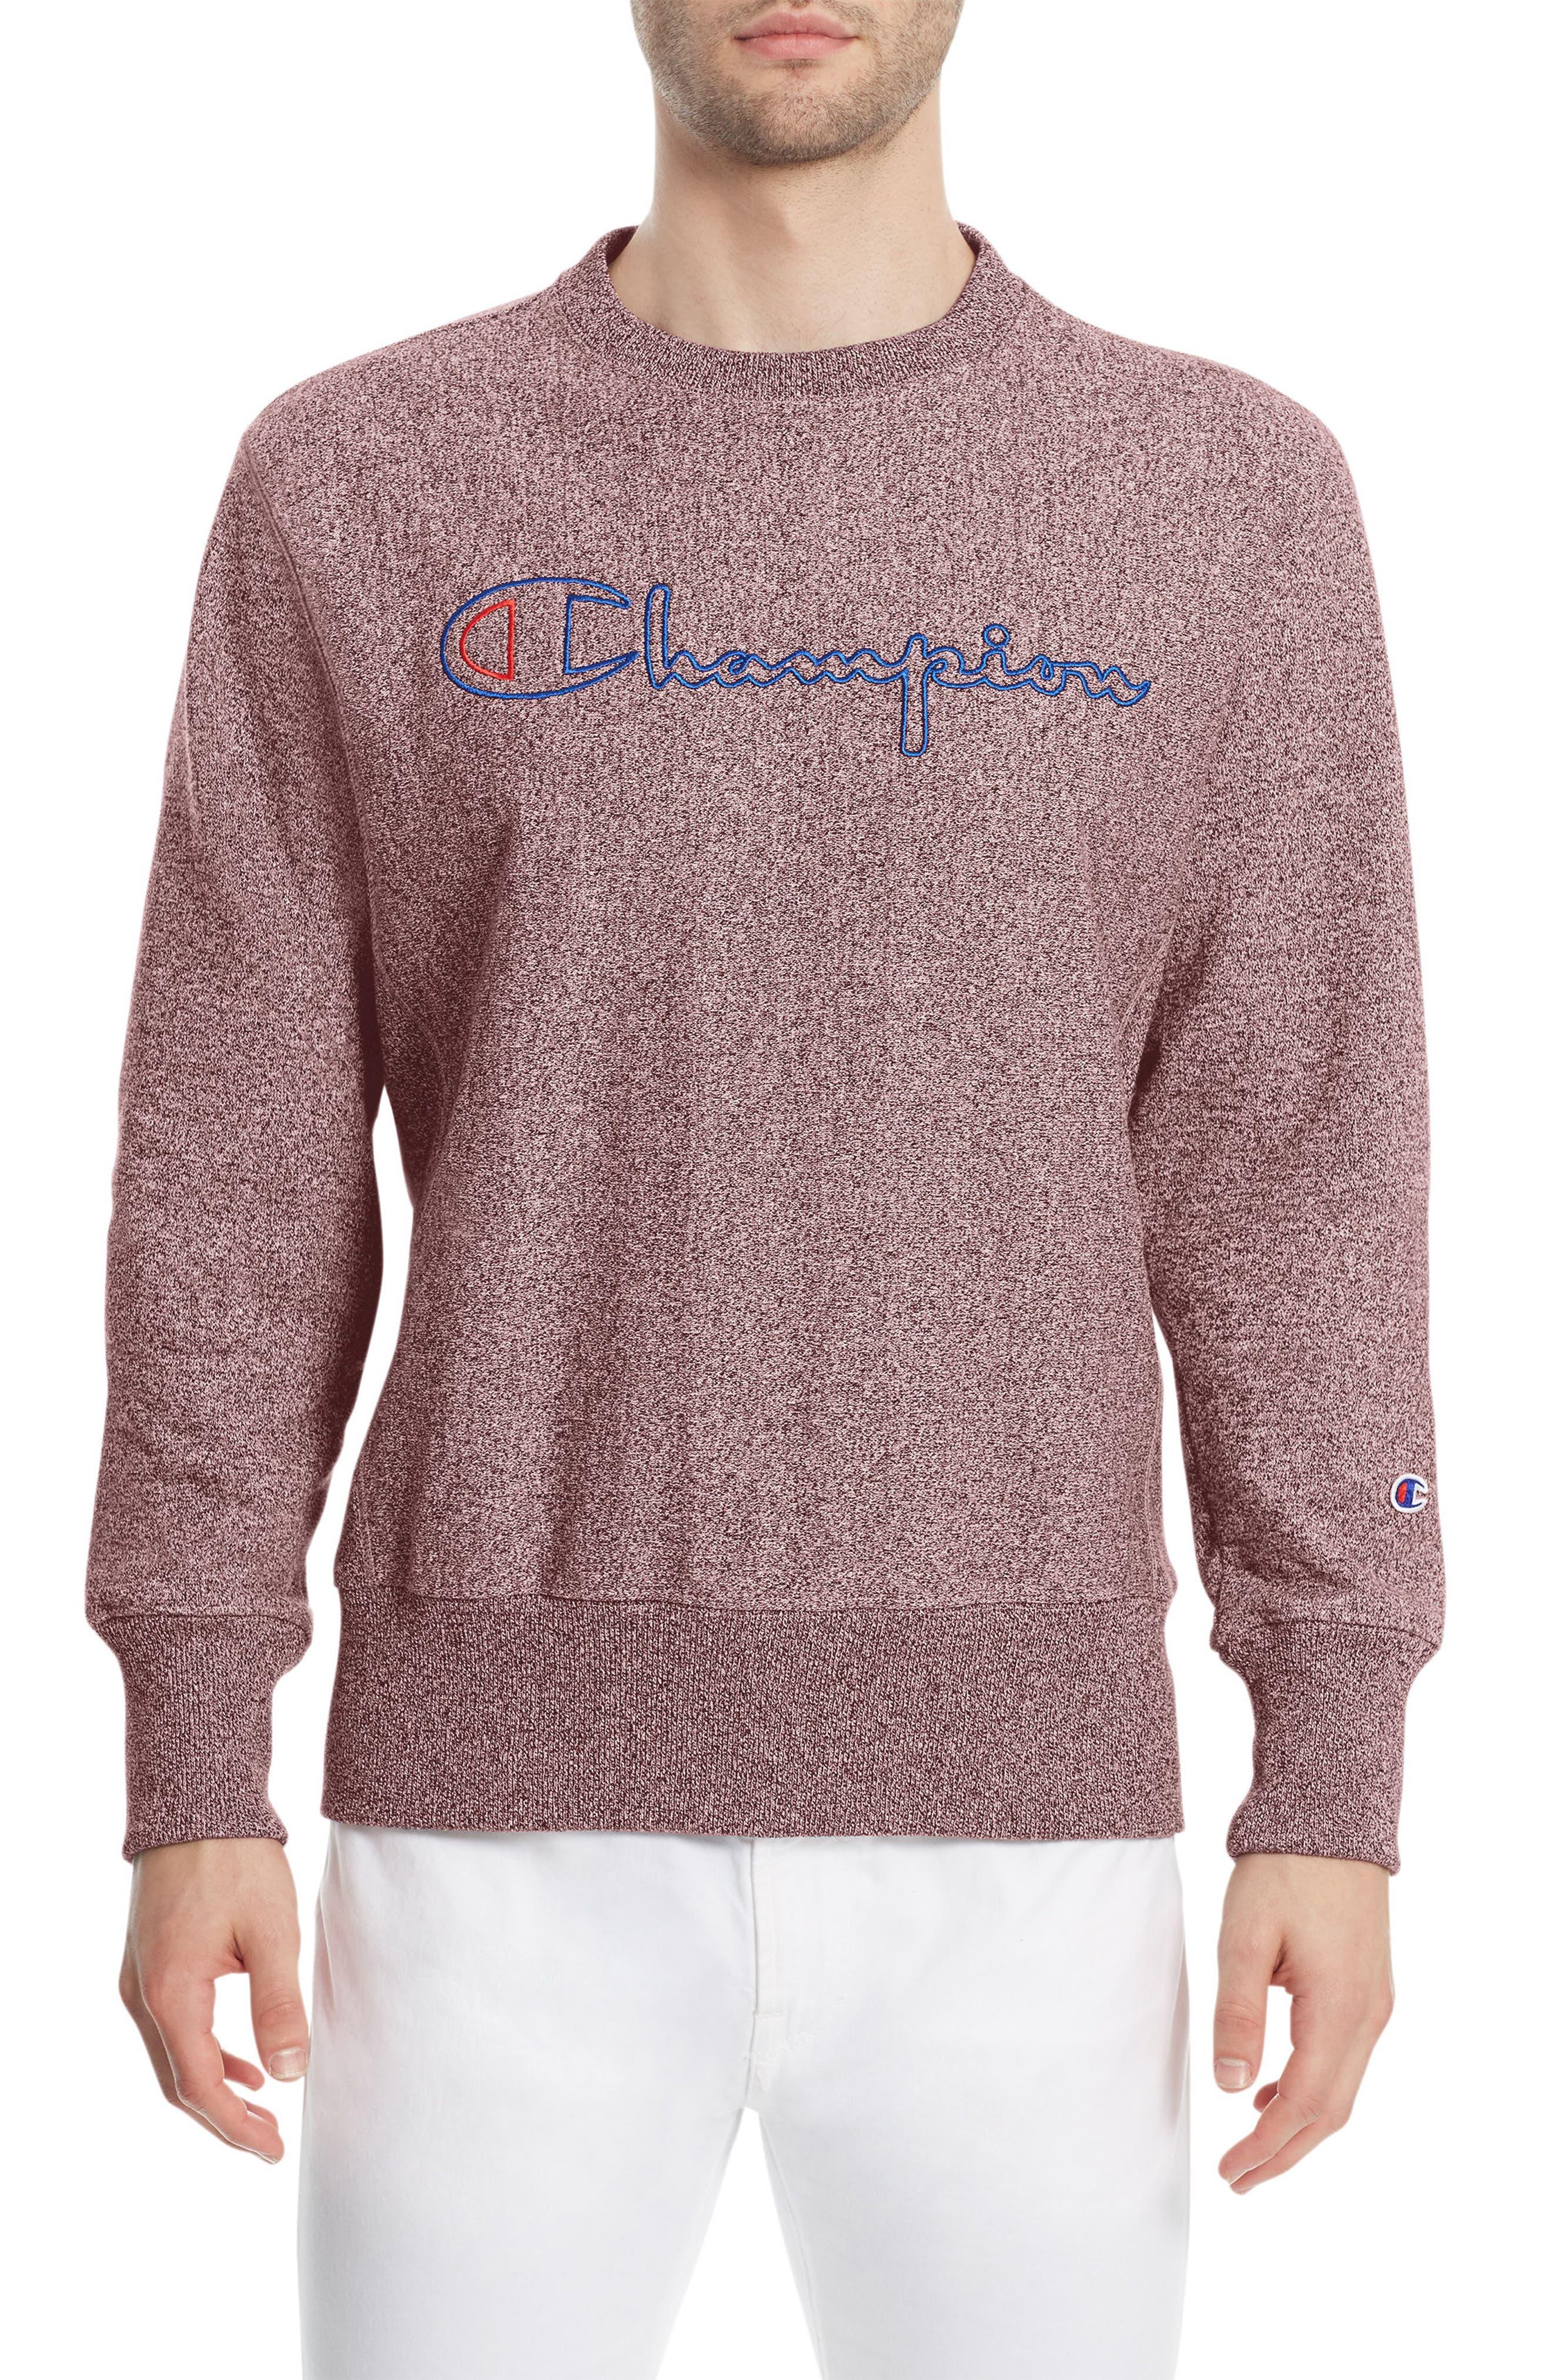 Jaspé Sweatshirt,                         Main,                         color, Maroon